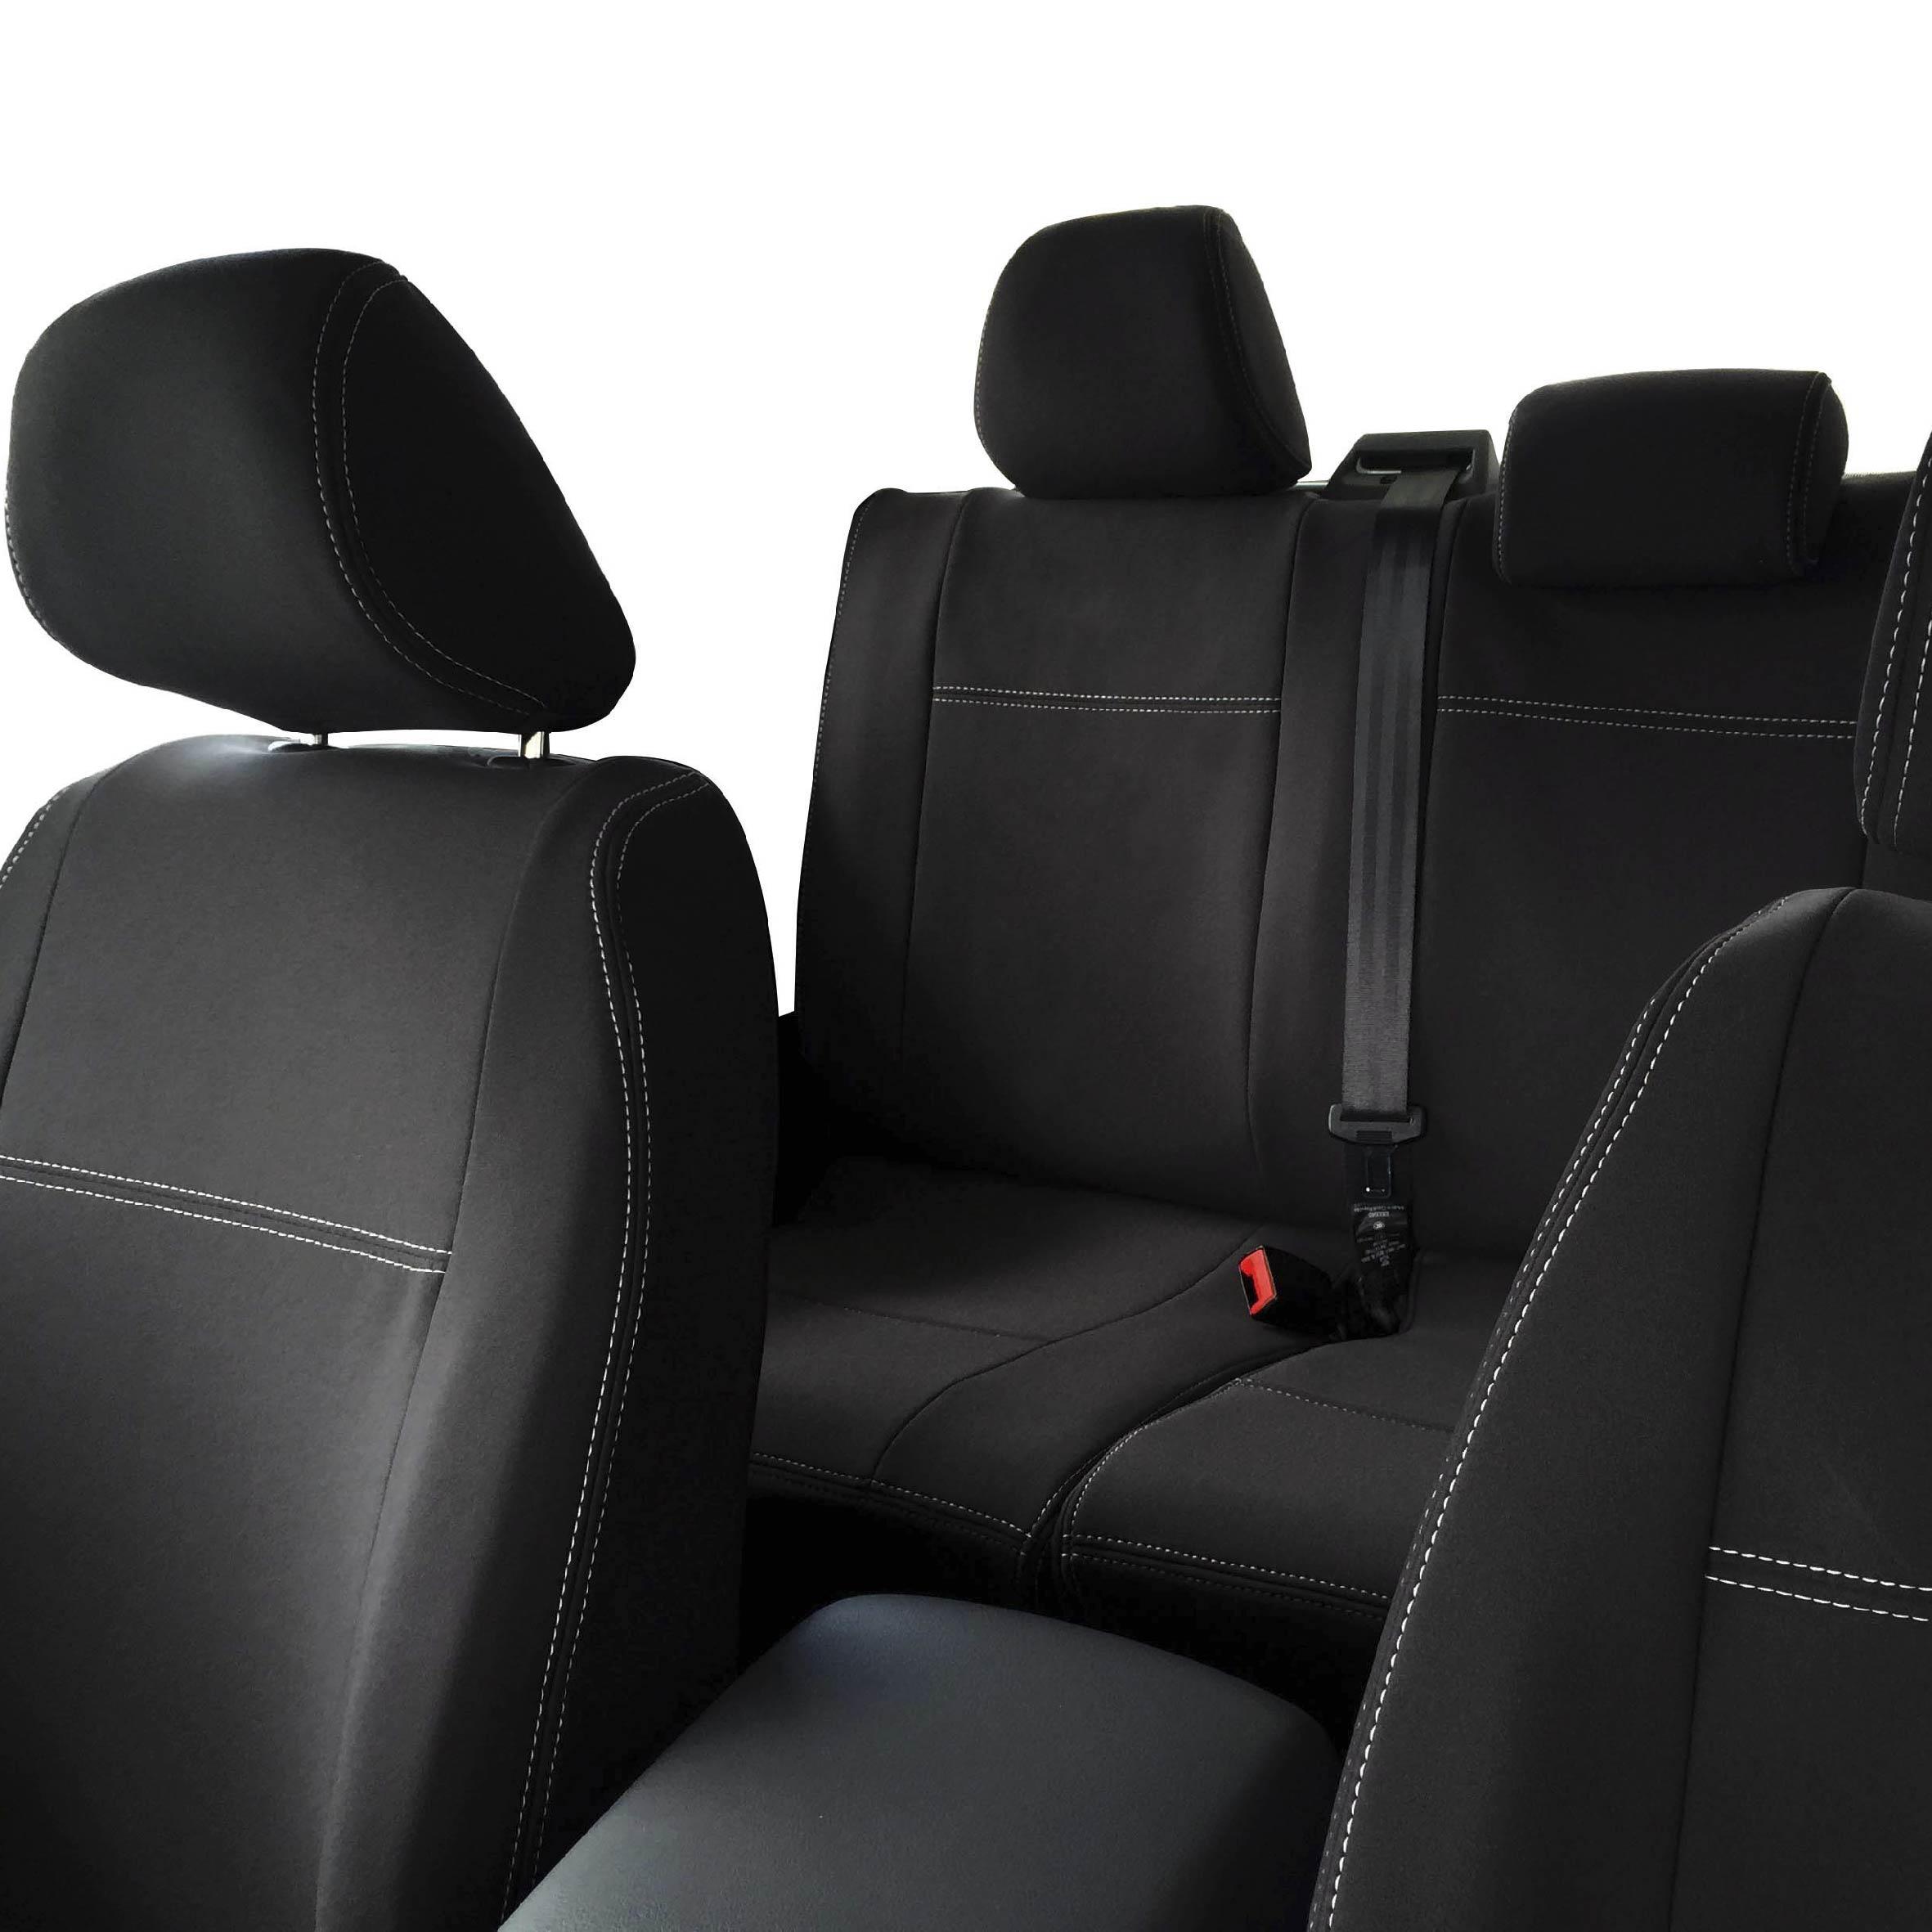 VW Volkswagen Amarok 2011 Grey Waterproof /& Tailored Rear Bench Seat Cover